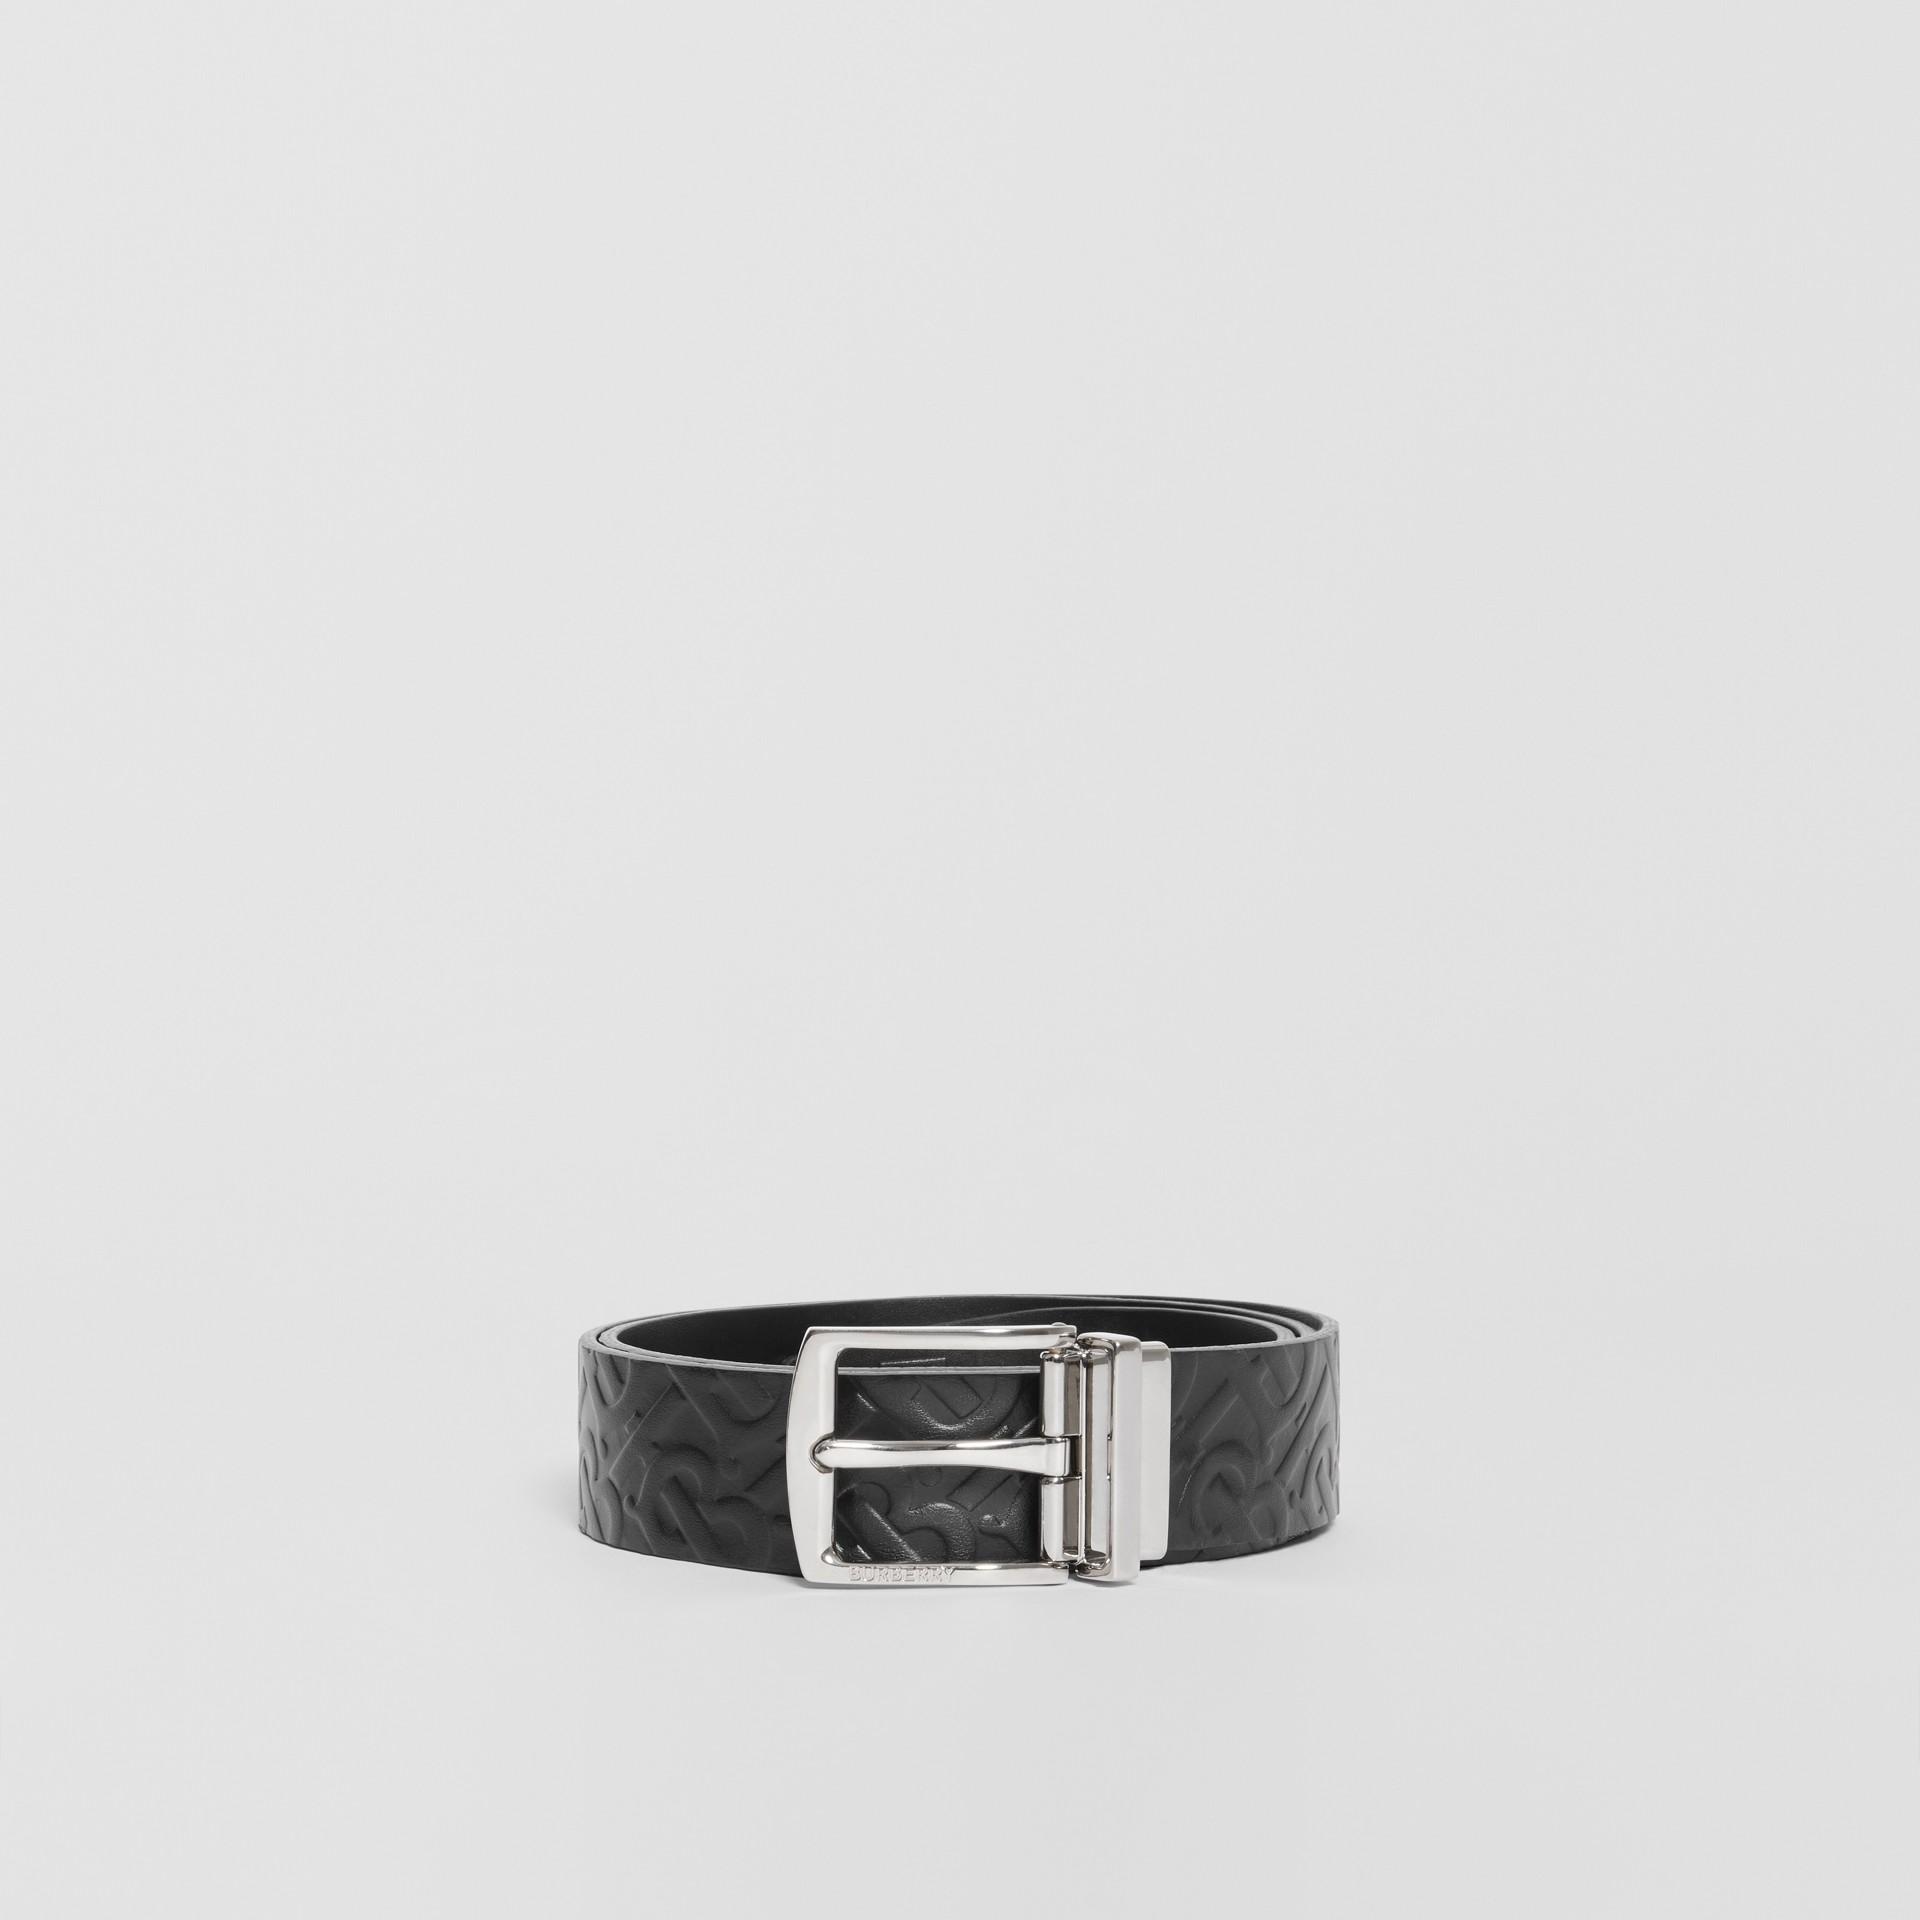 Reversible Monogram Leather Belt in Black - Men | Burberry - gallery image 3